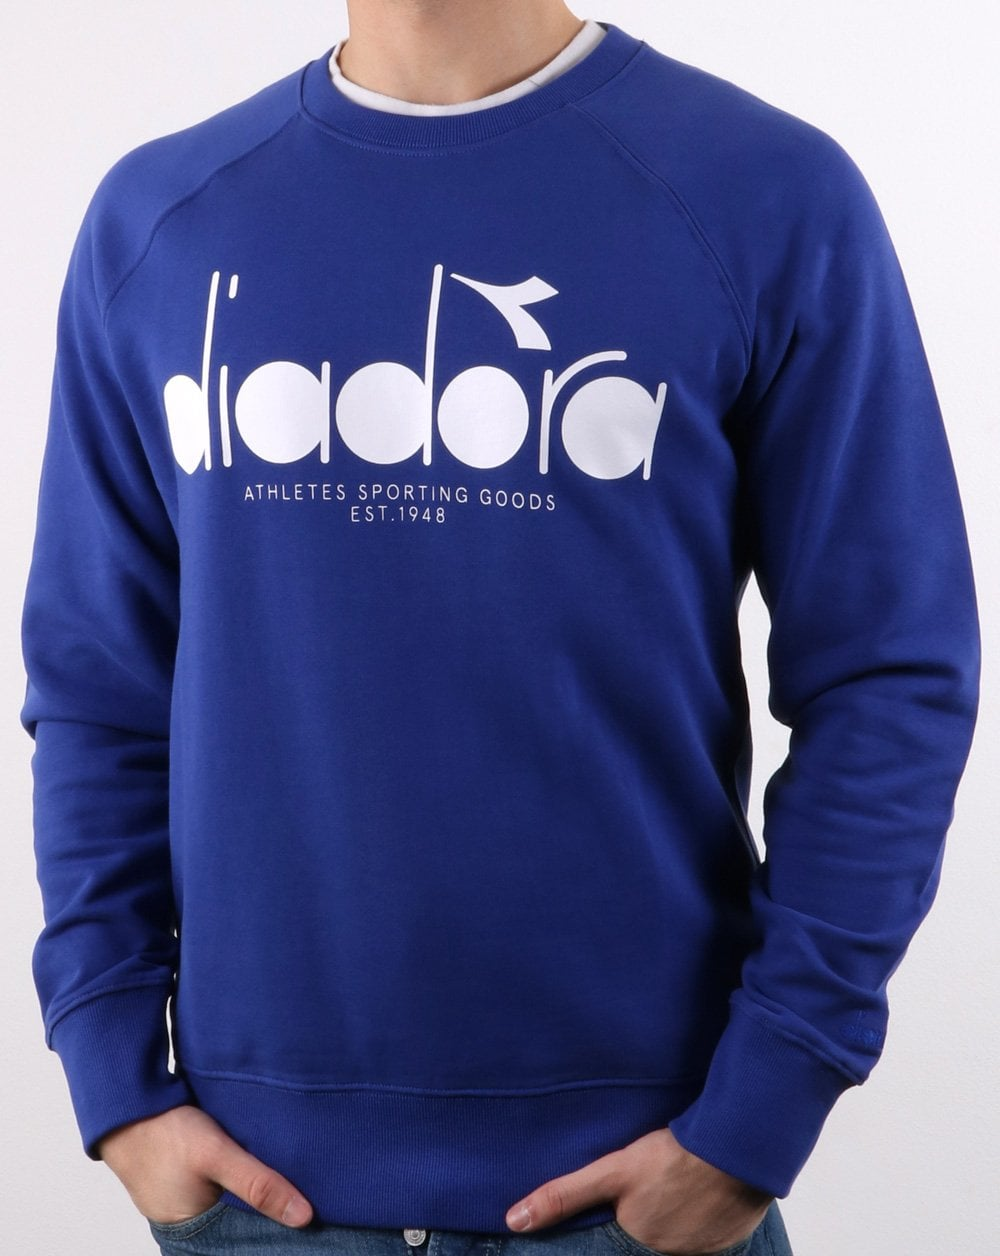 Diadora sweatshirt logo